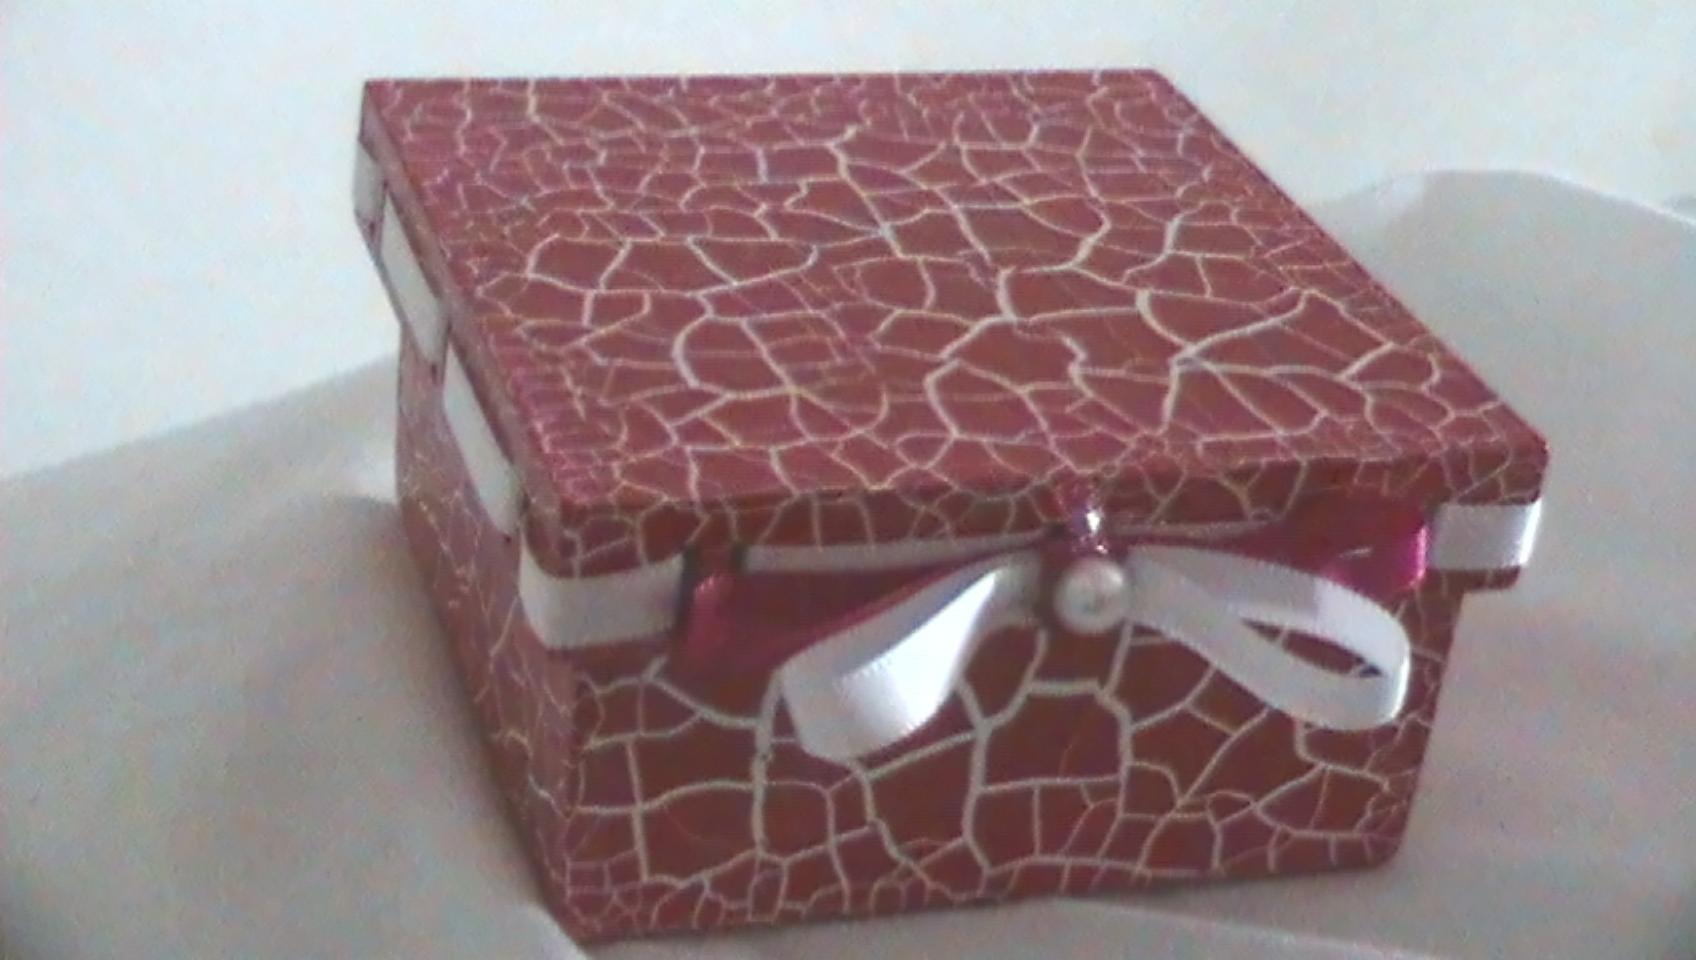 caixa de mdf com craquele caixa de mdf com craquele #694043 1696x960